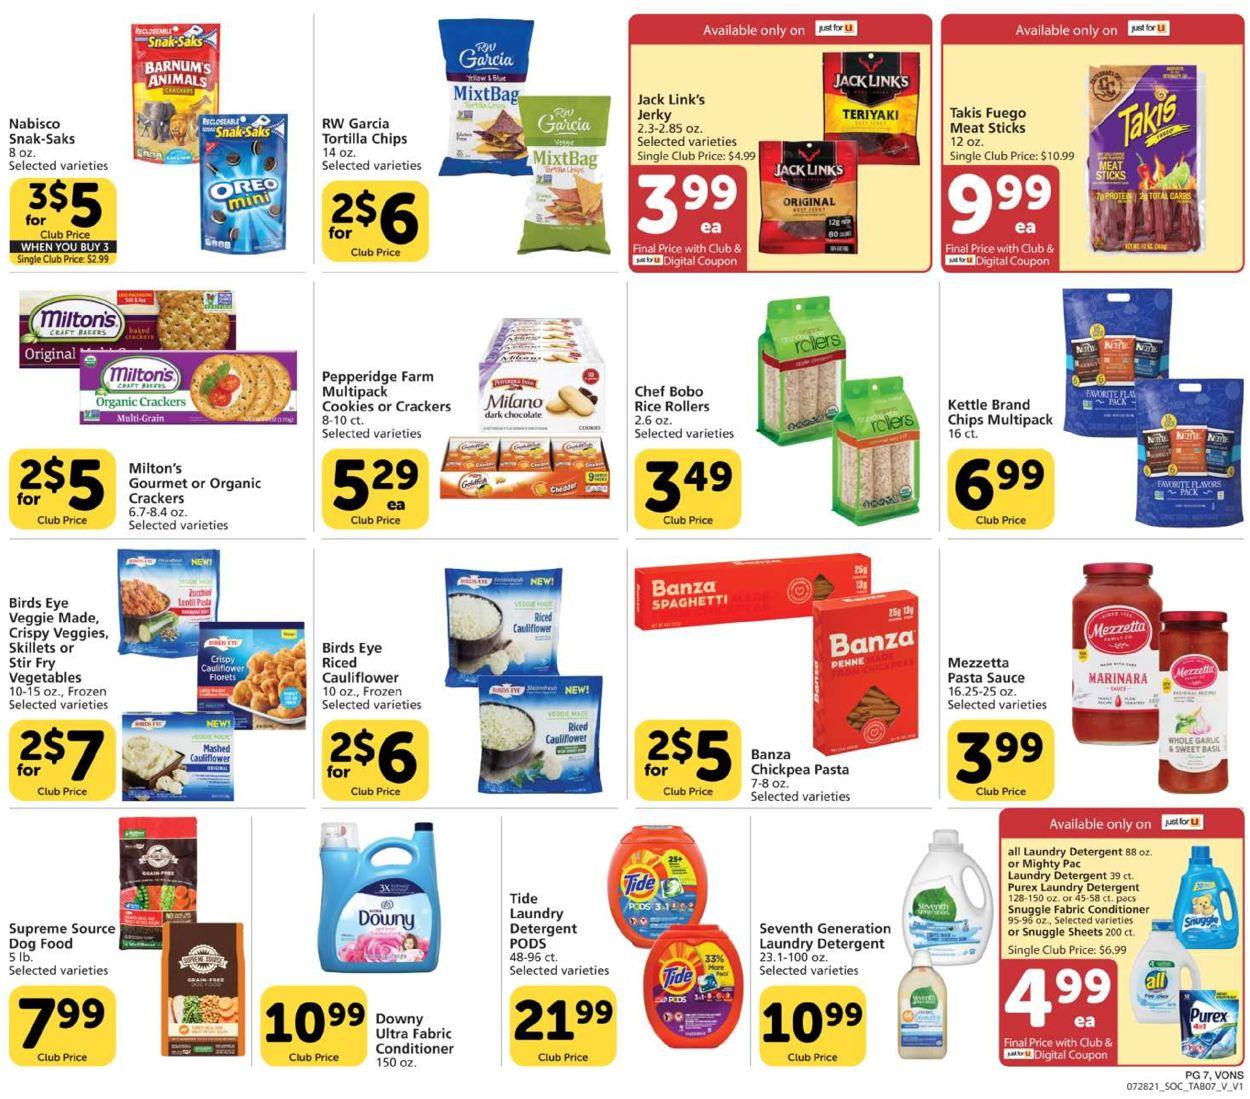 Vons Weekly Ad Circular - valid 07/28-08/25/2021 (Page 7)